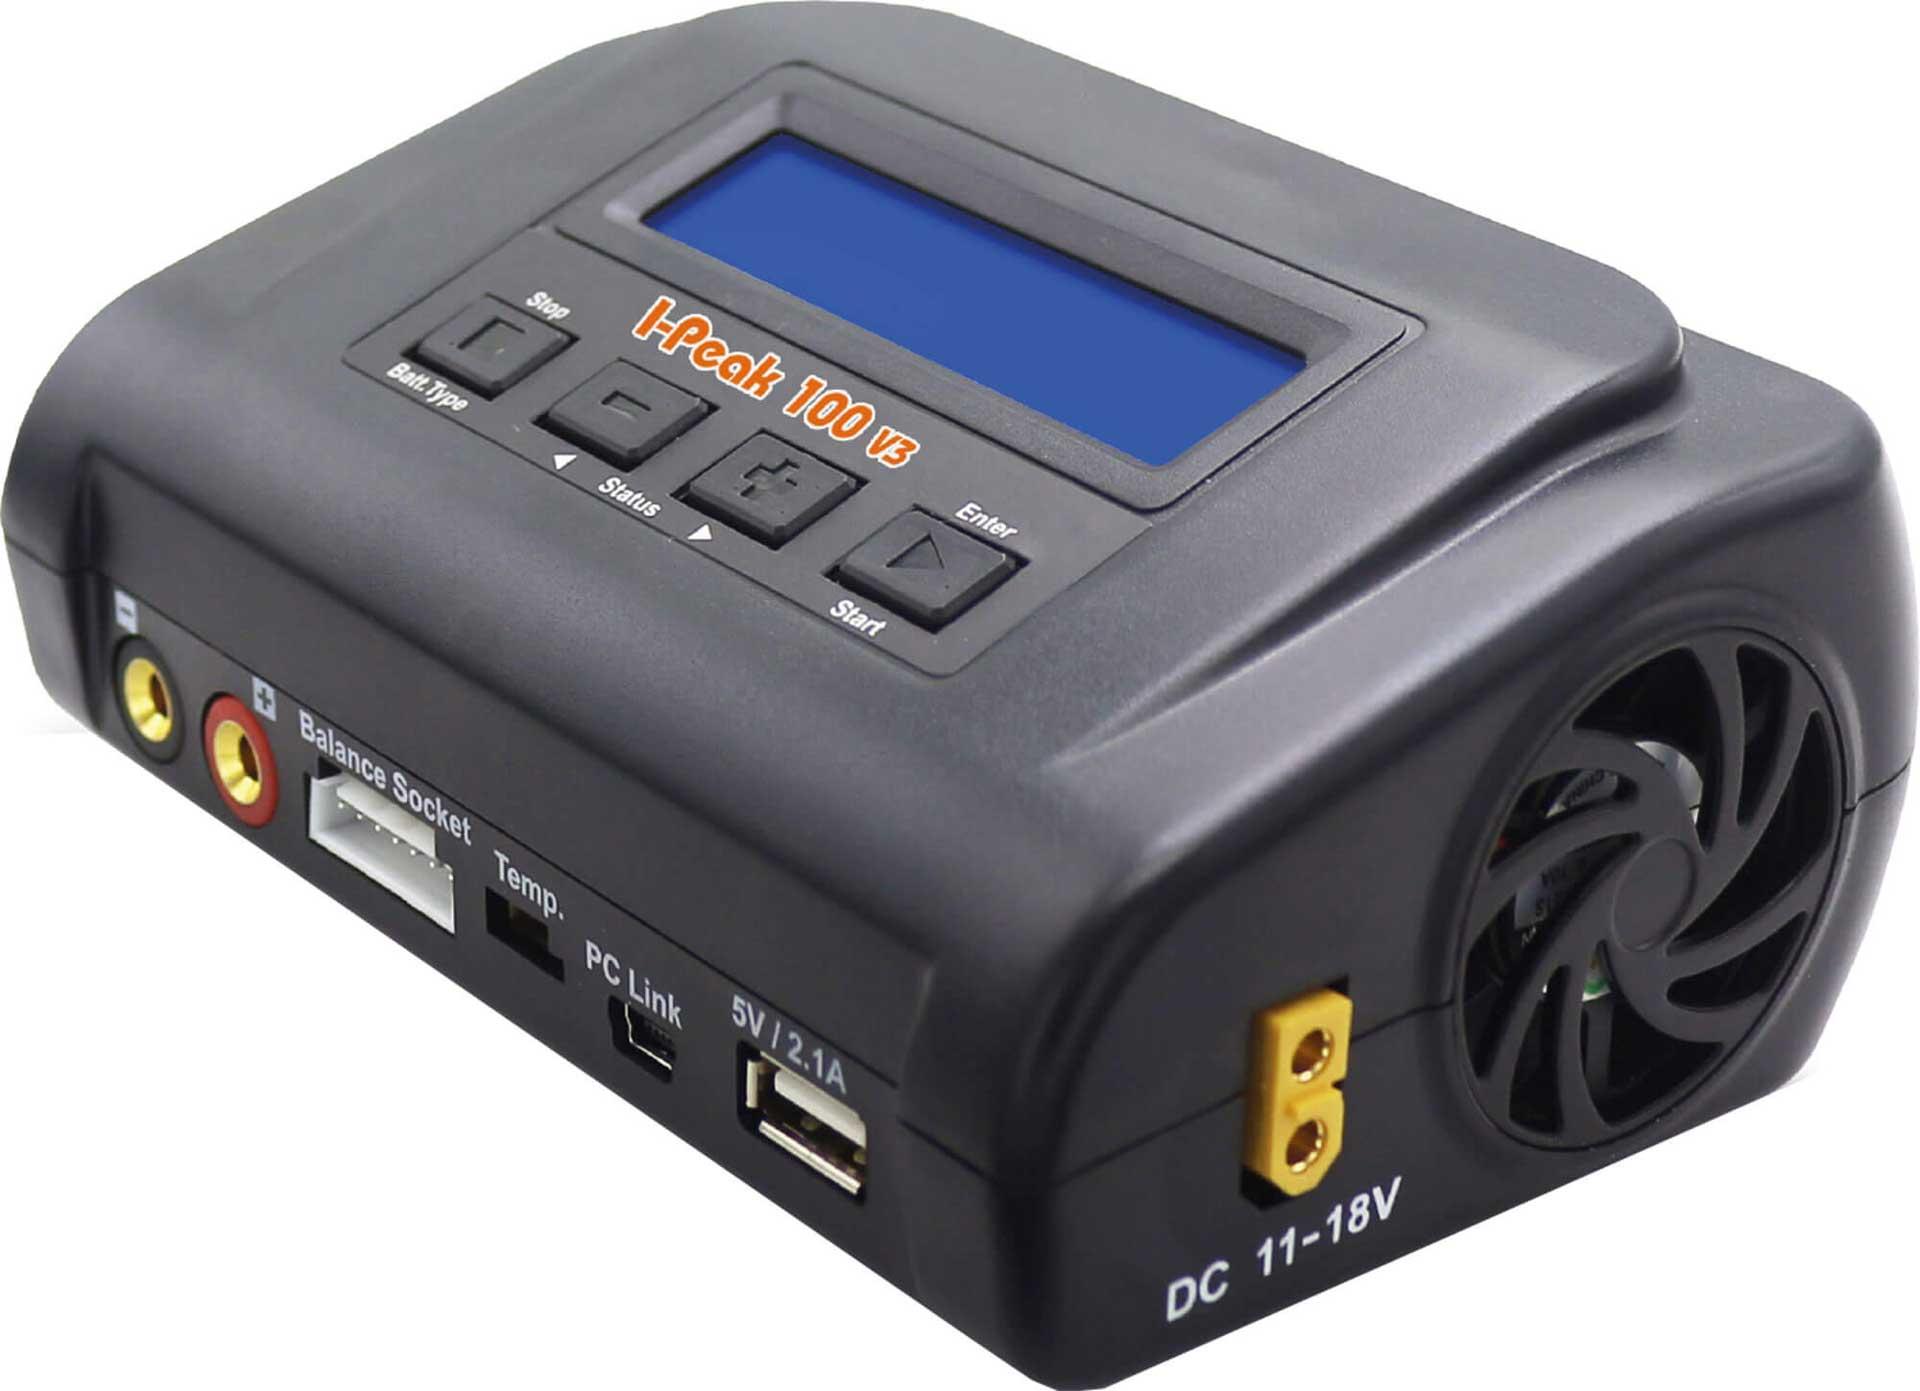 DRIVE & FLY MODELS I-PEAK 100 V3 AC/DC CHARGER